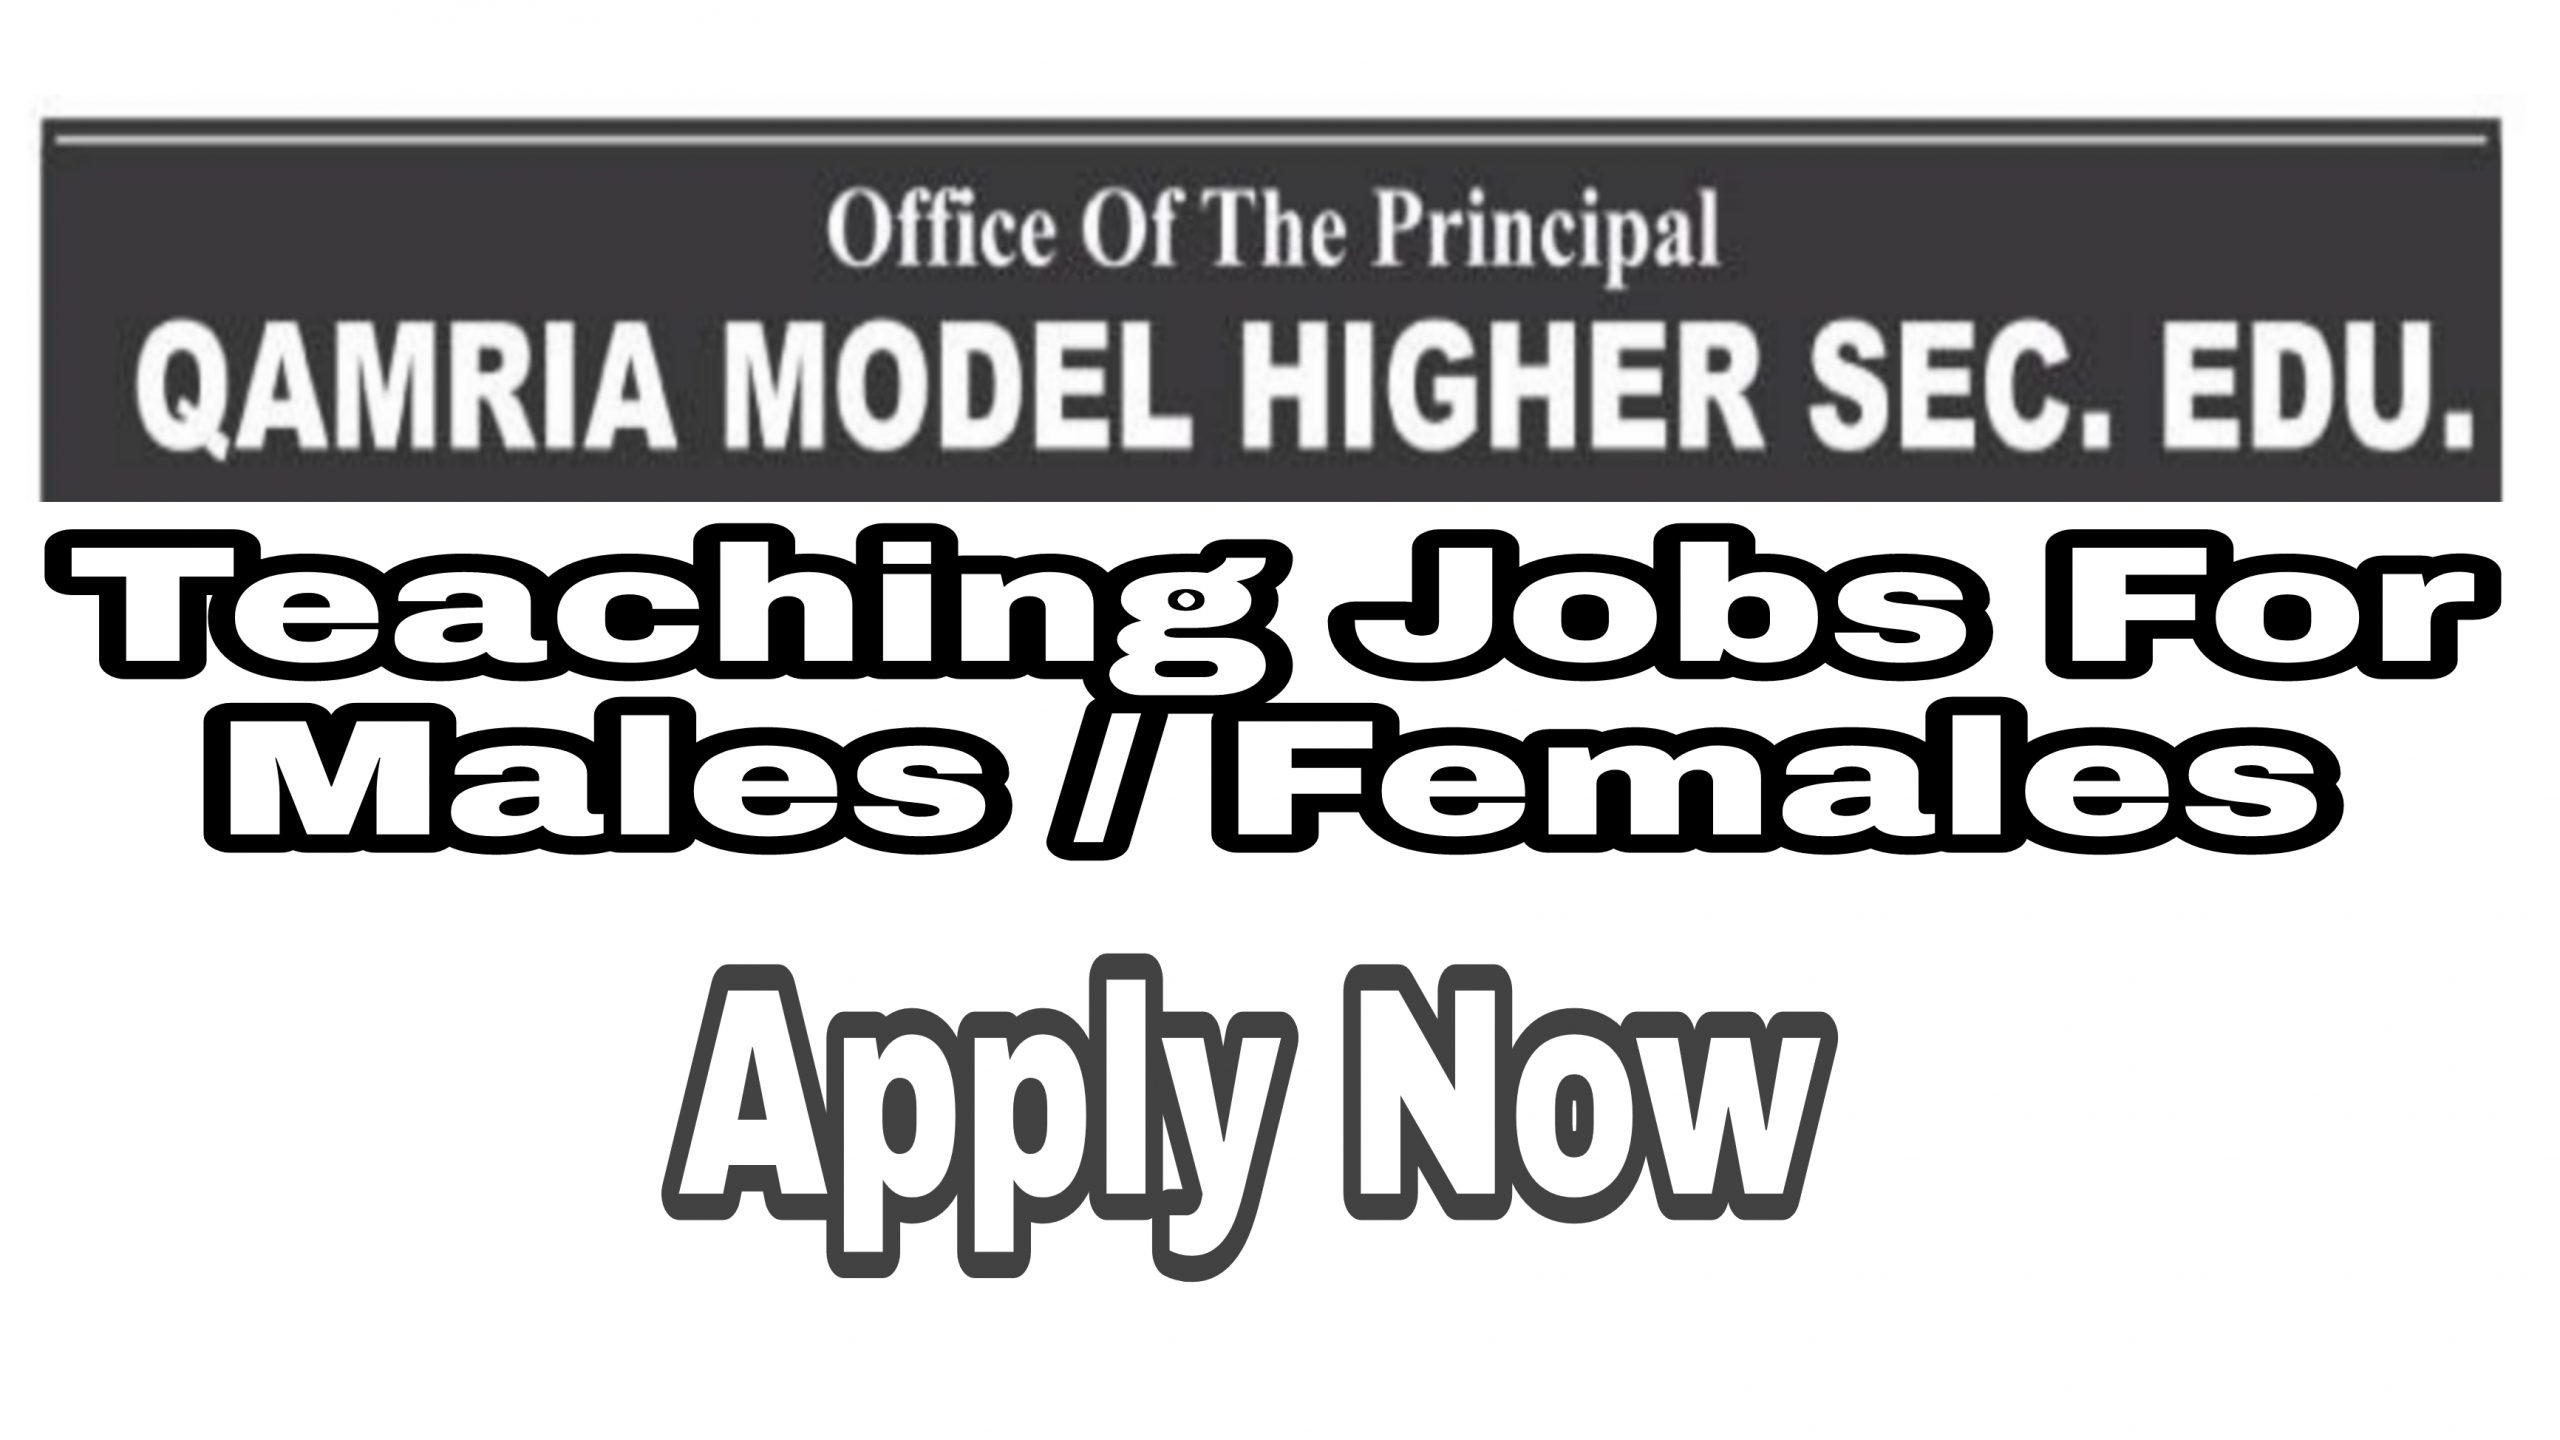 Qamaria Model High School Ganderbal Saloora Jobs Teaching